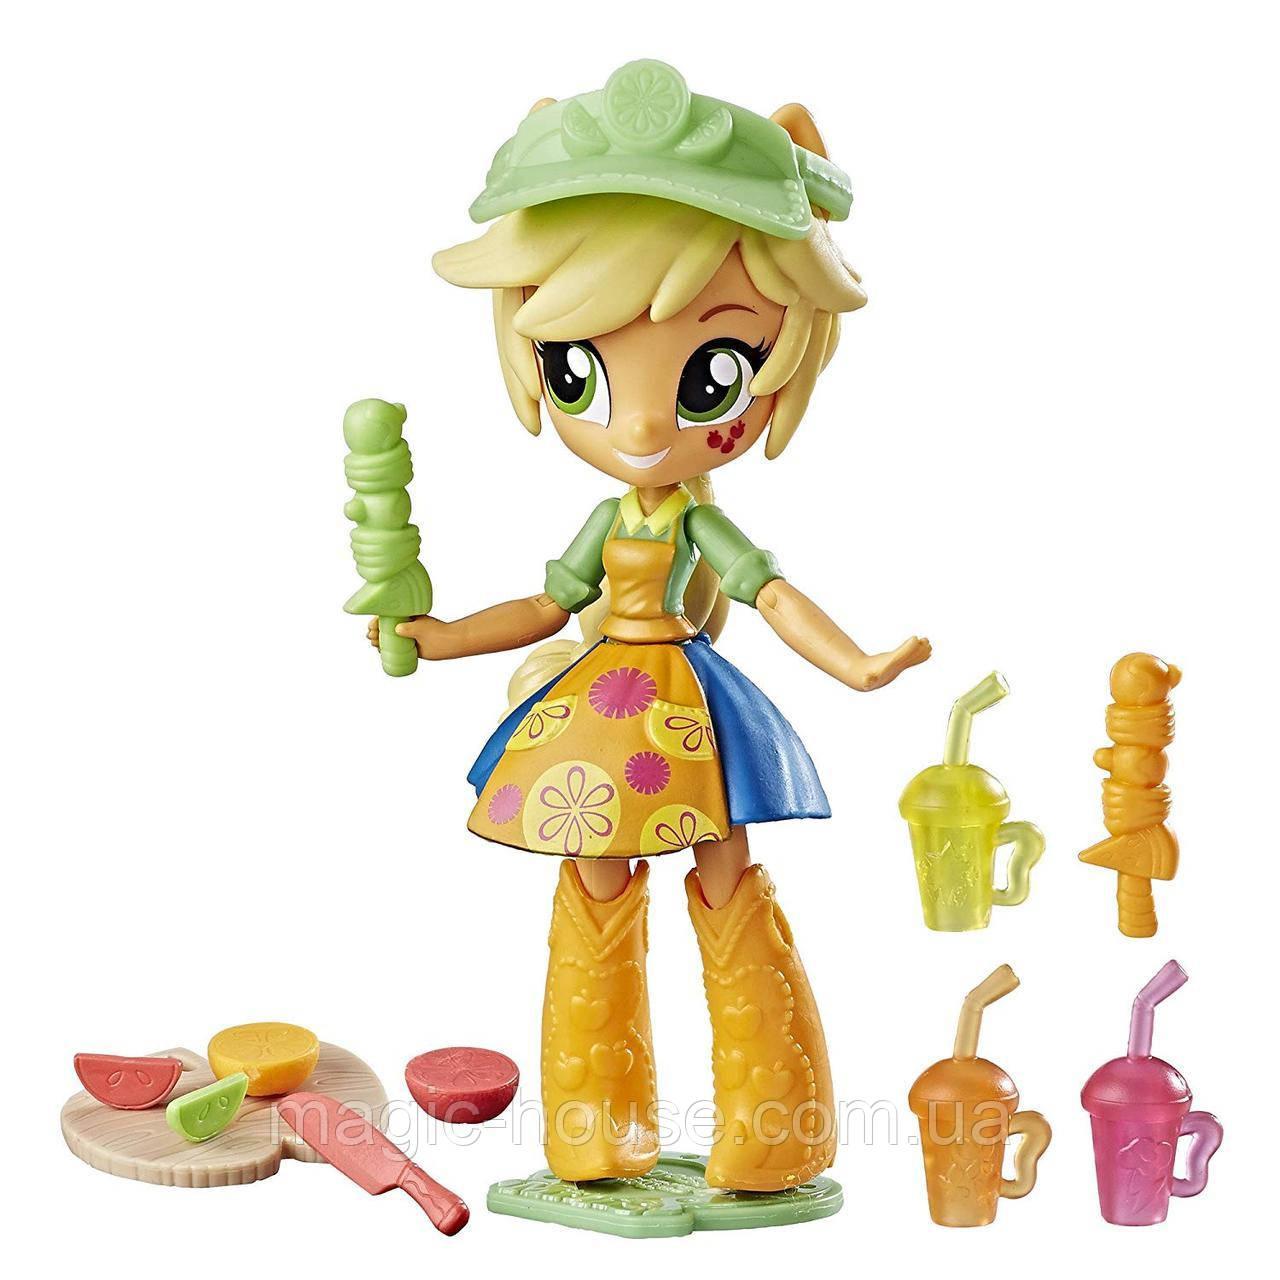 Набор My Little Pony куколкаМай литл пони мини Эпплджек магазин фруктовых смузиEquestria Girls Applejack Fru